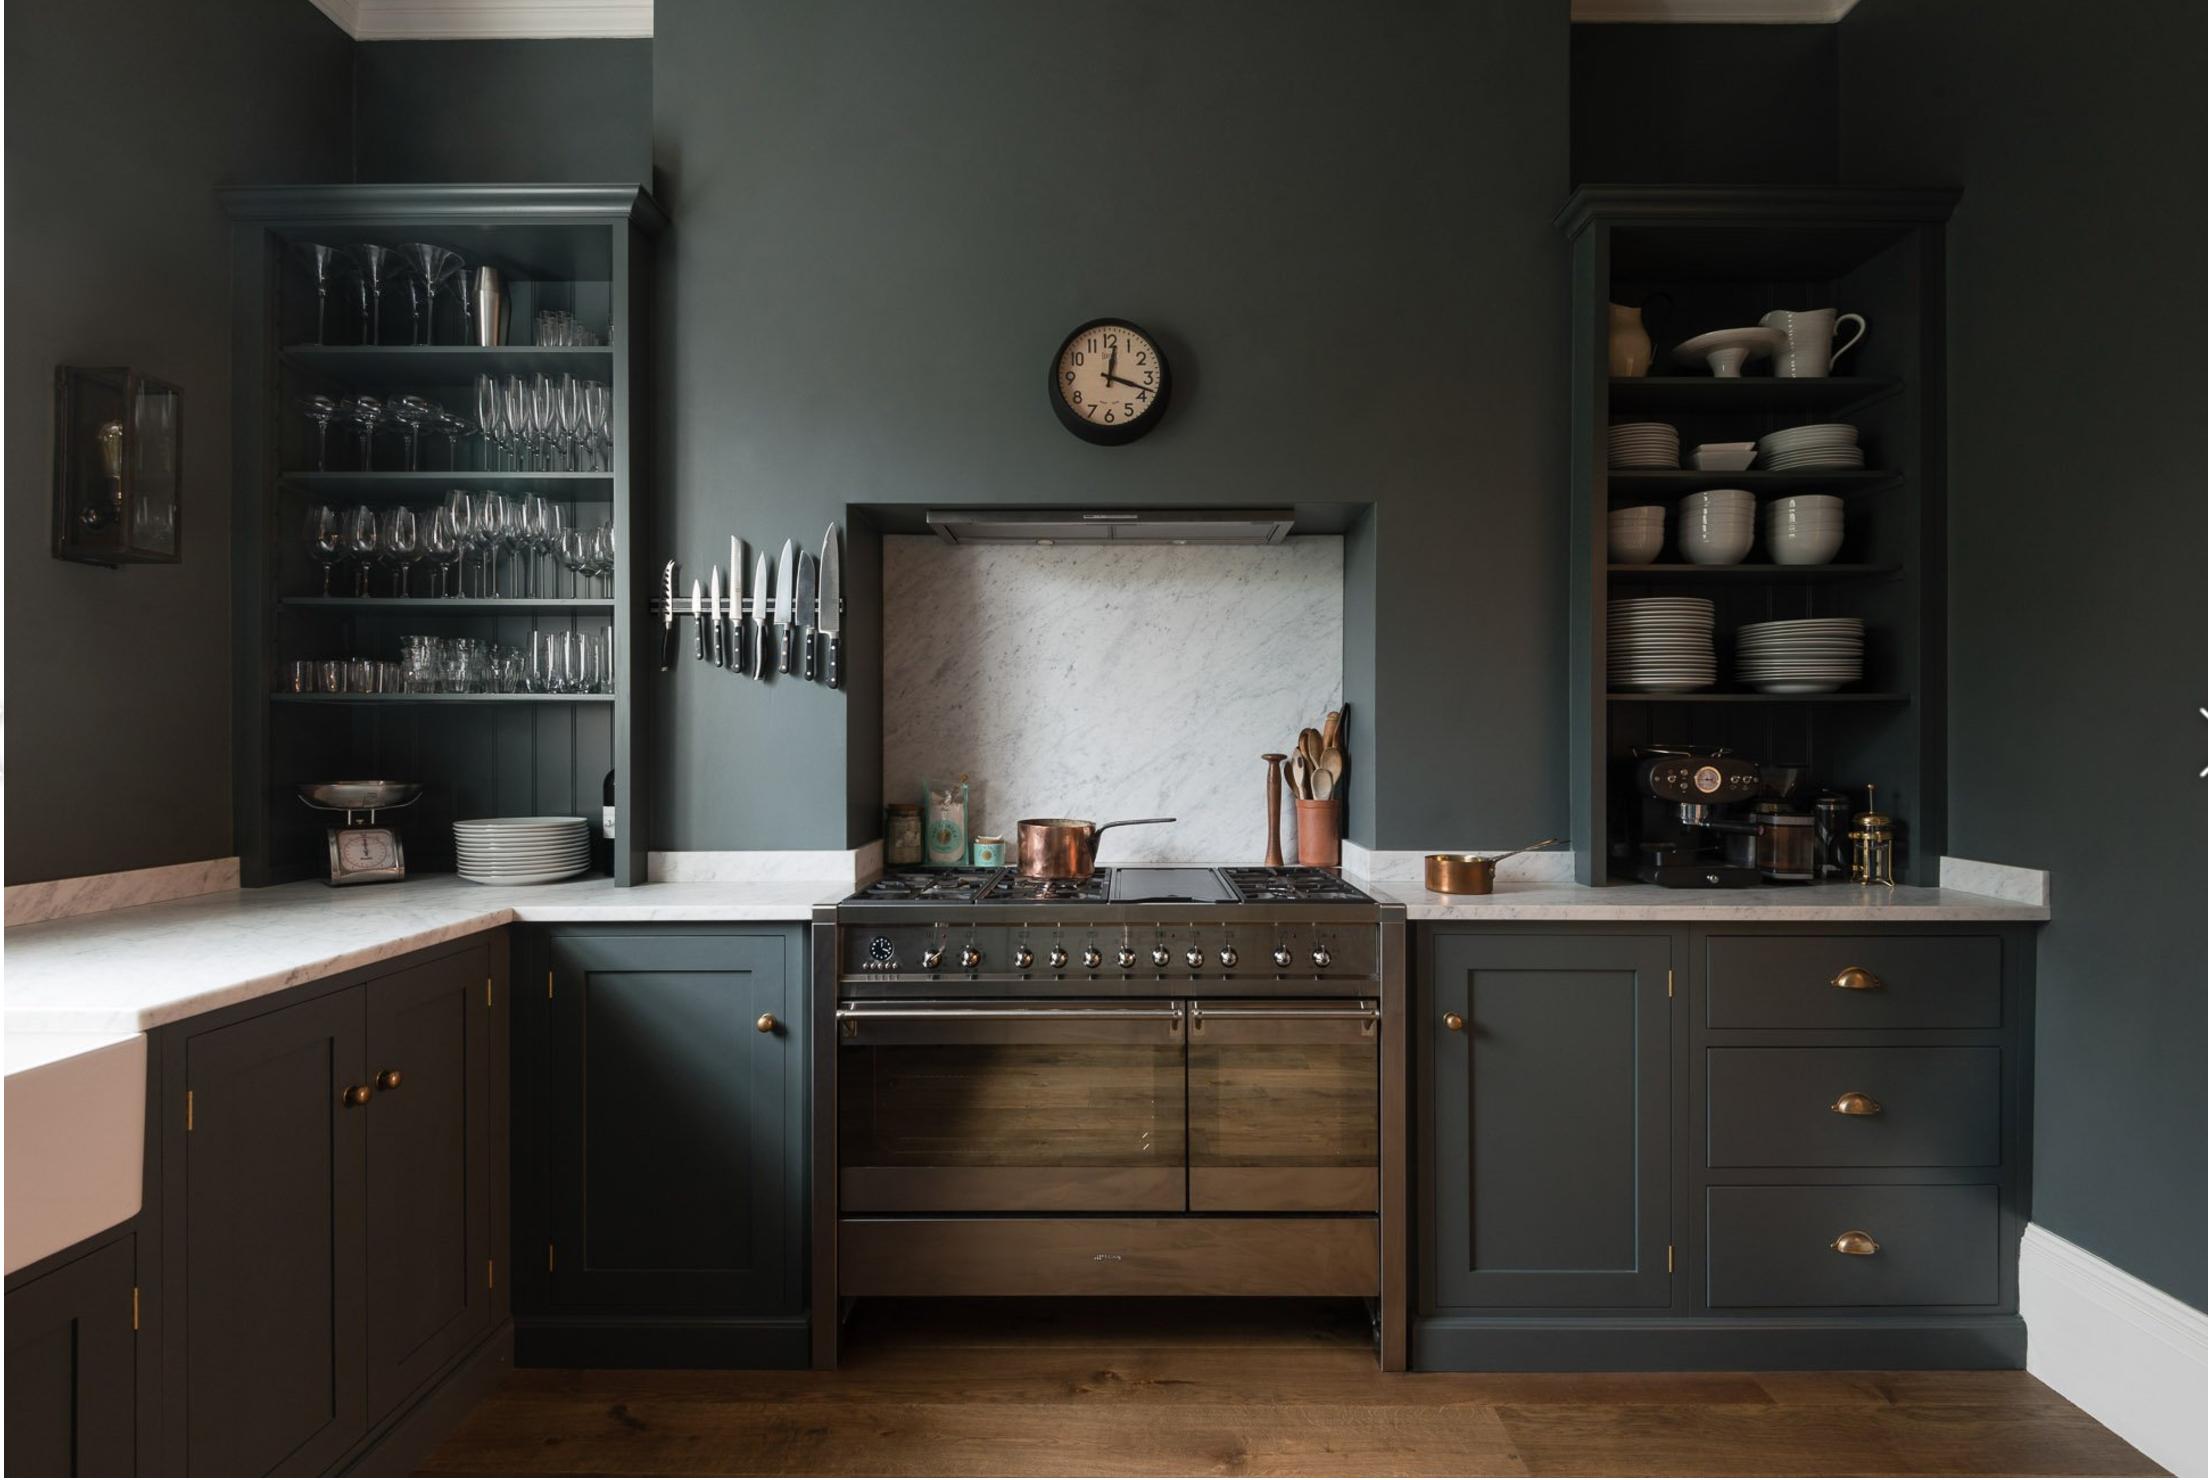 10 idee per fare ordine in cucina – Foto